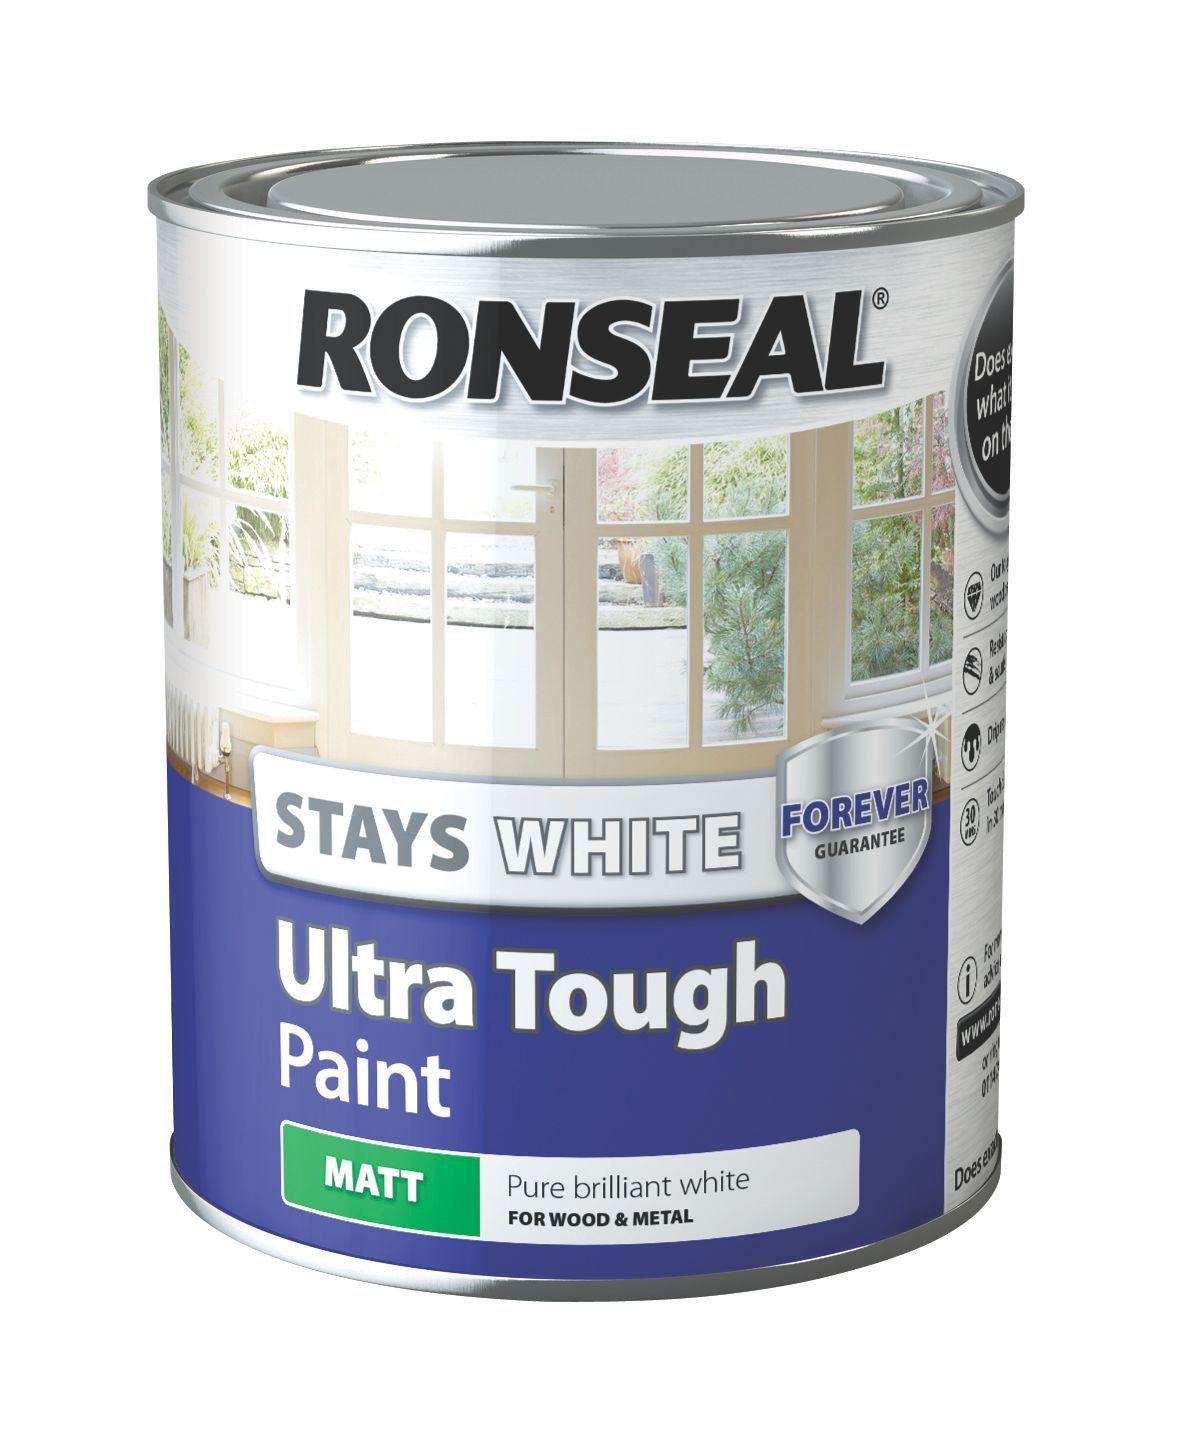 Ronseal interior exterior pure brilliant white matt wood metal paint 750ml departments - Matt exterior paint image ...